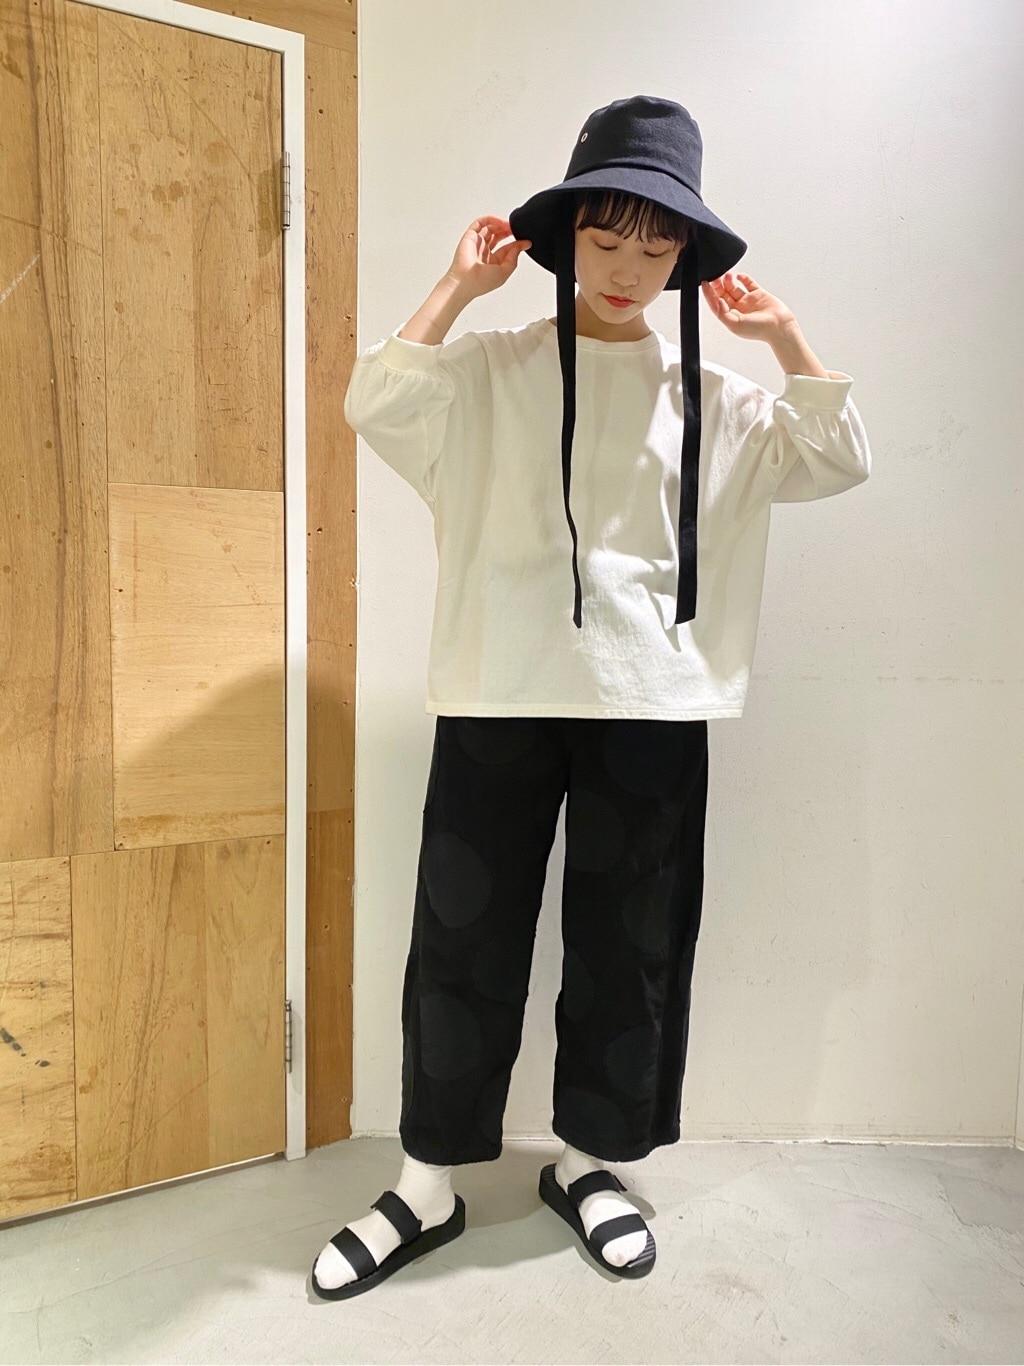 l'atelier du savon 新宿ミロード 身長:159cm 2020.06.11